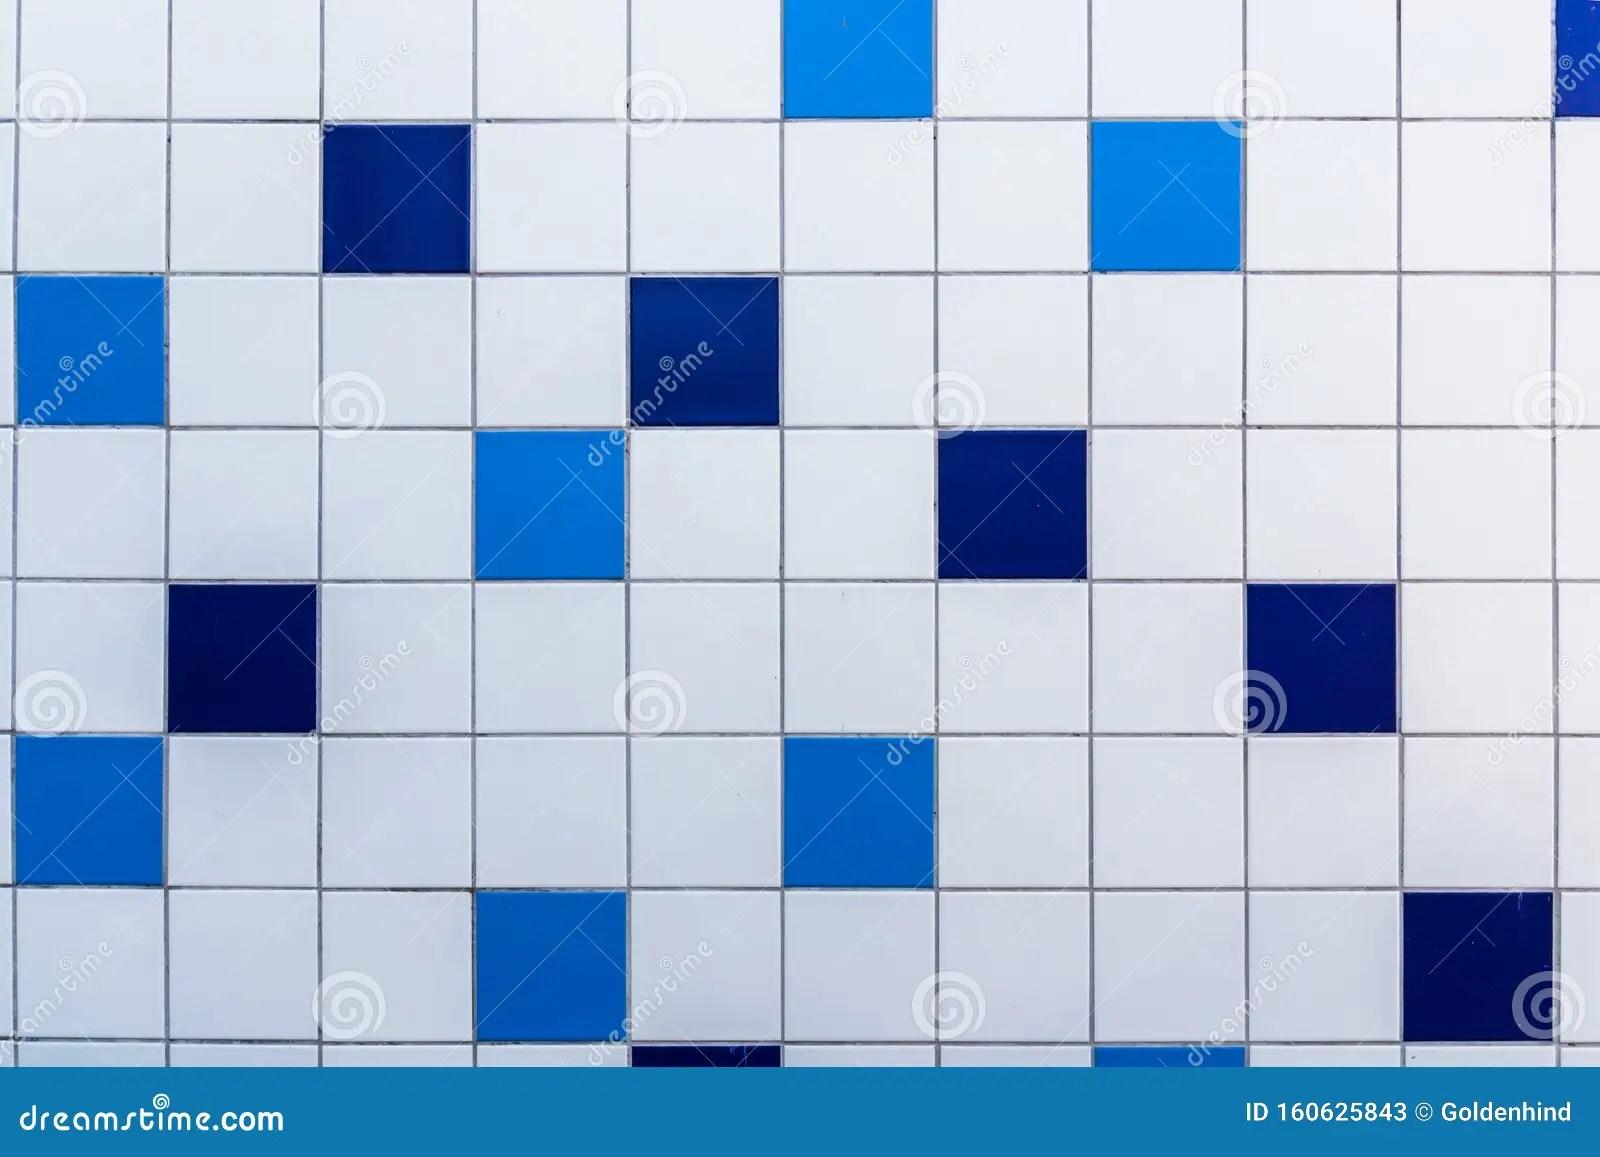 https www dreamstime com mosaic blue white ceramic tiles texture background bathroom floor wall clean architecture decor decoration design image160625843